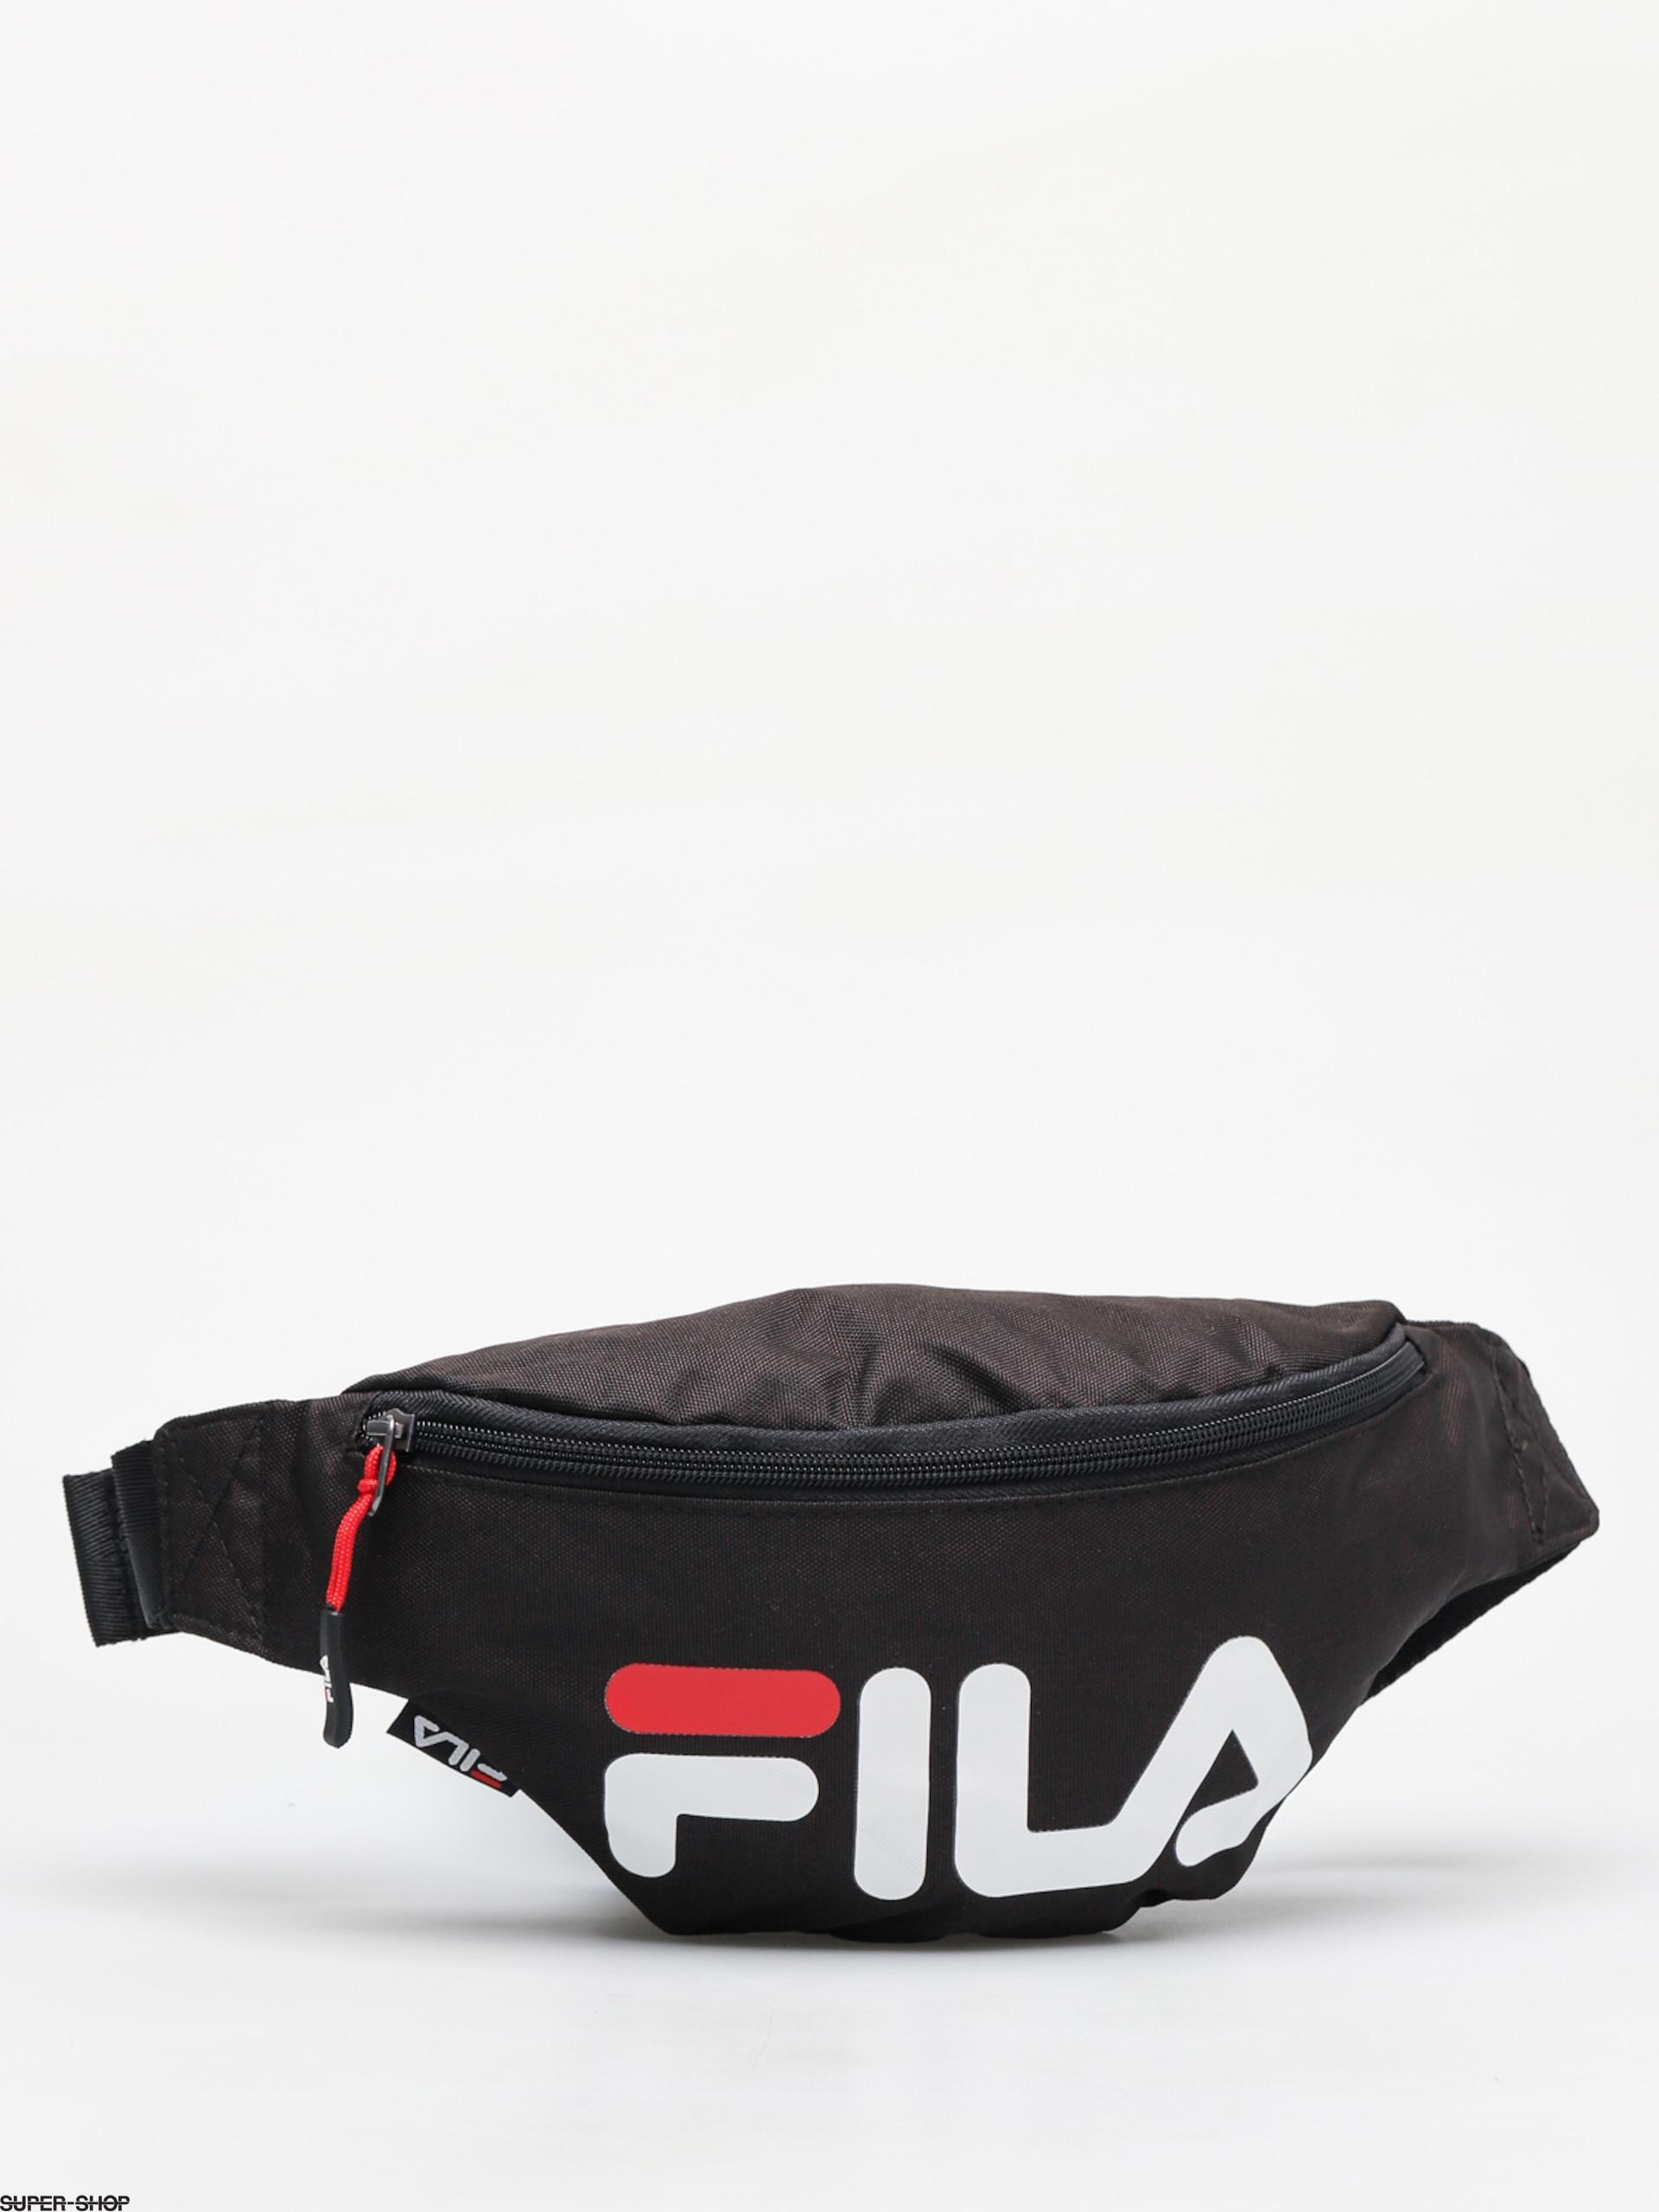 b2c2908b07c3 Fila Waist Bag Slim Bum bag (black)